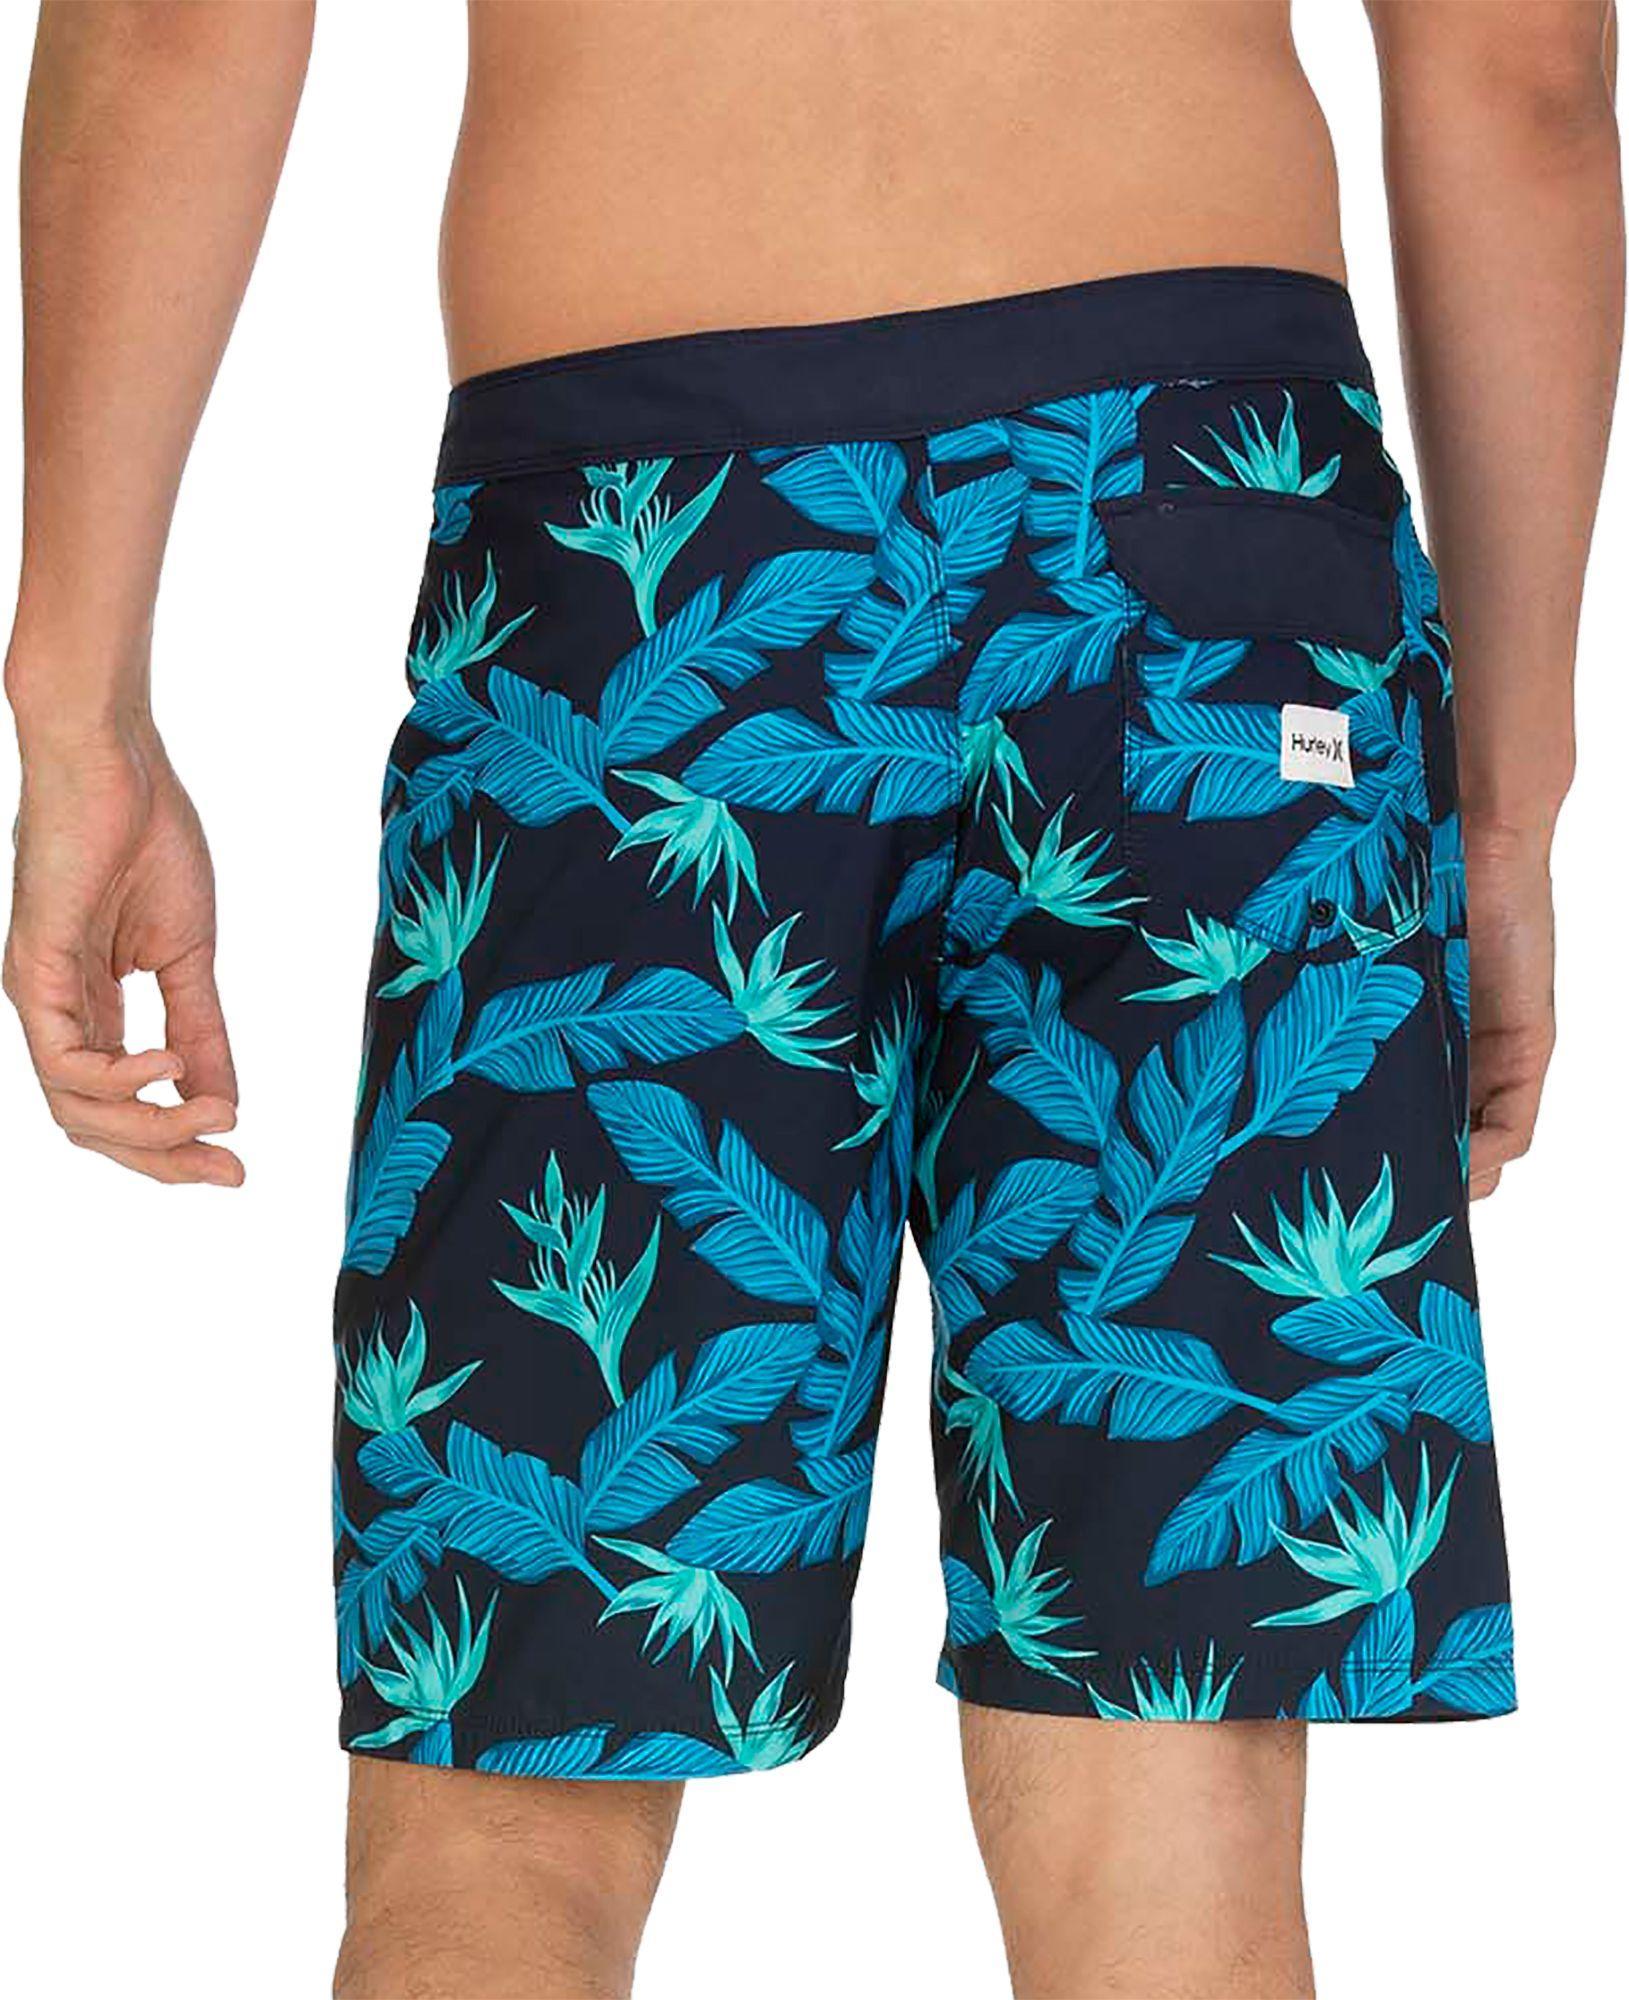 ddb2d91d96756 Lyst - Hurley Hanoi Board Shorts in Blue for Men